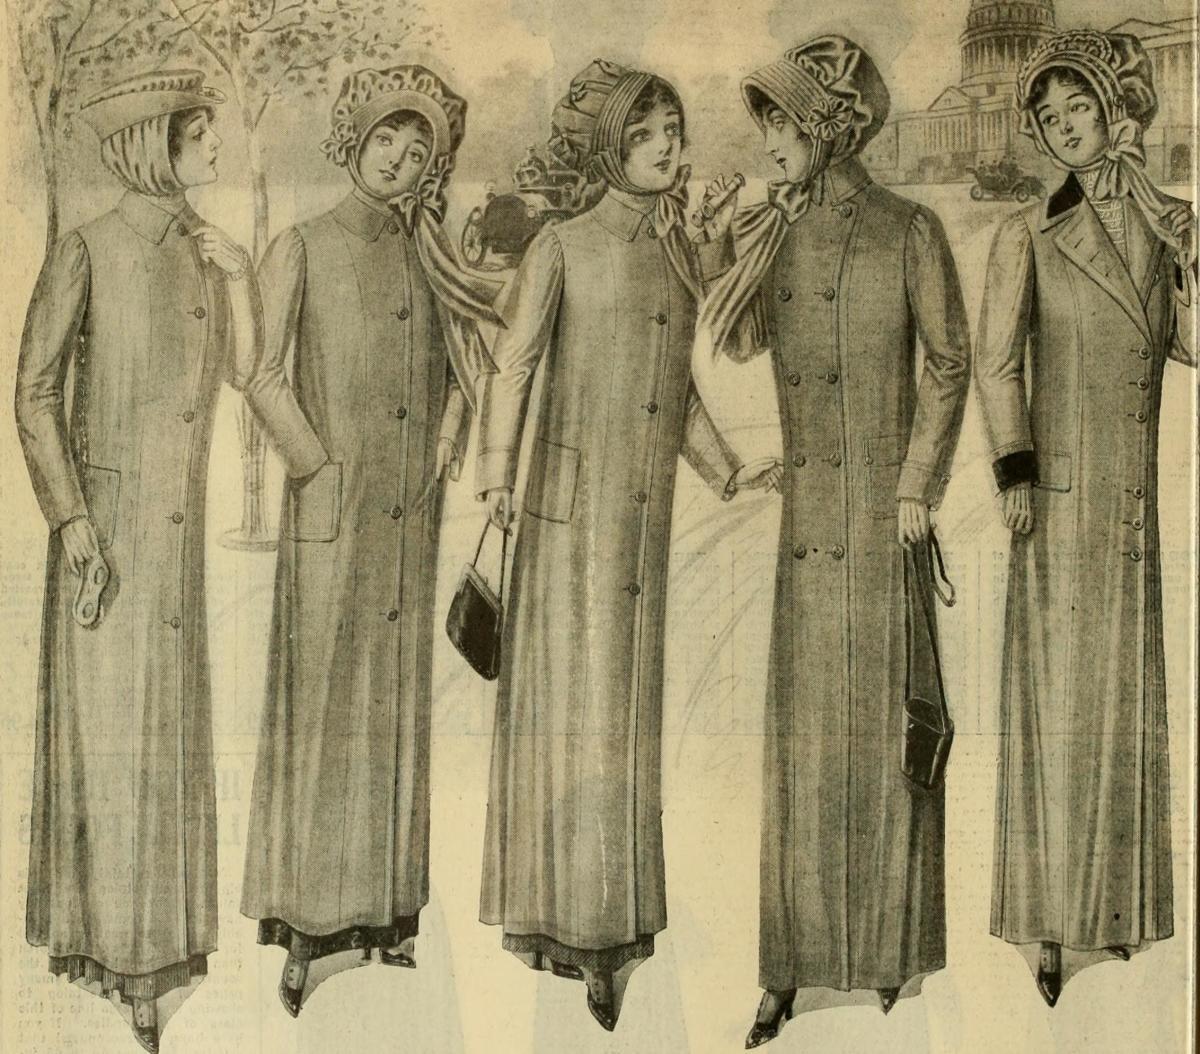 Macy's fashion ad circa 1911